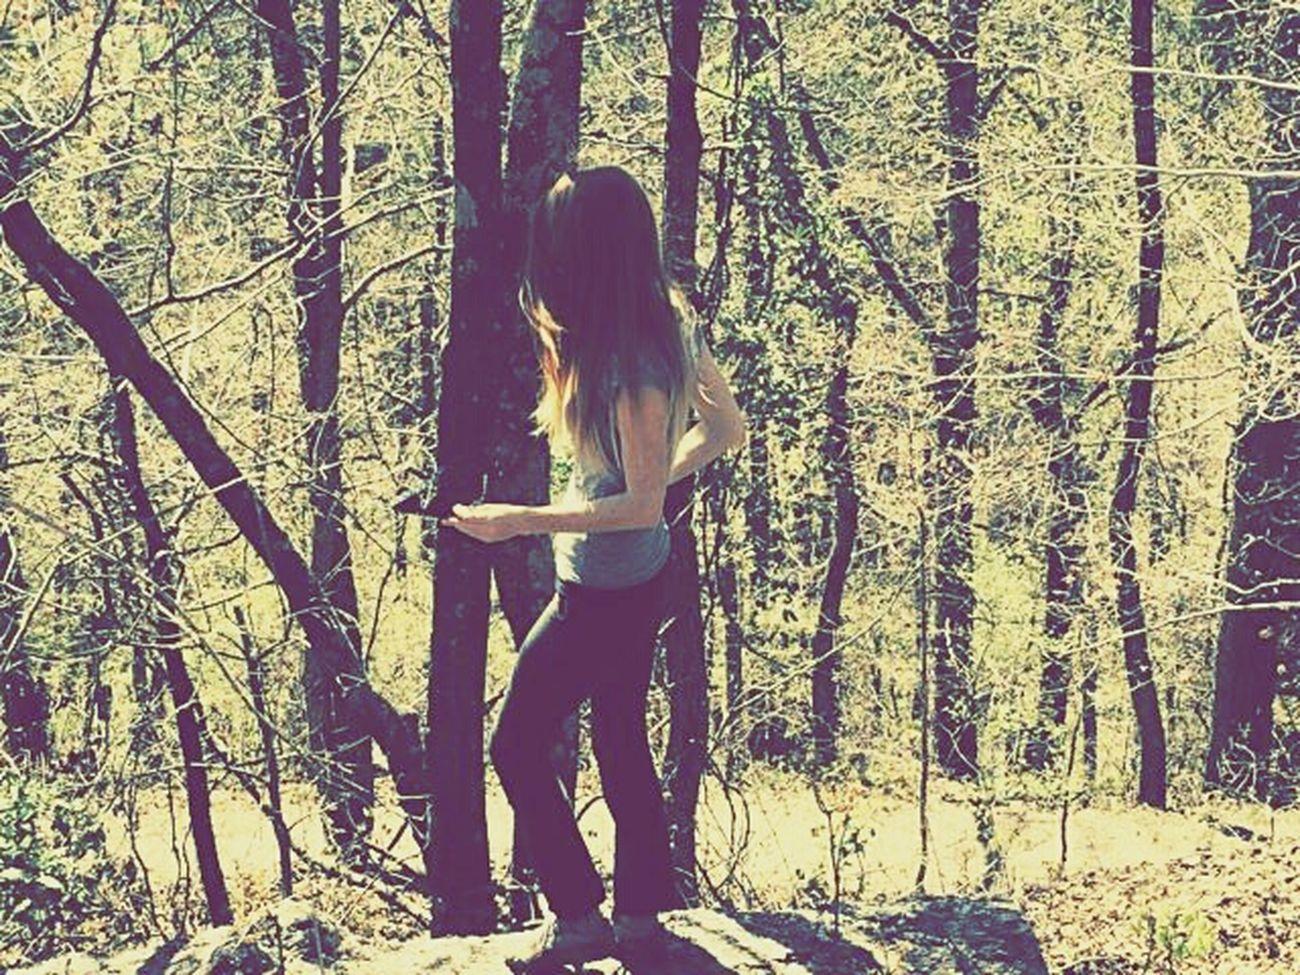 Hiking Barefoot Hikingadventures Hotspring Socks Trees Skinnybitch Jenbearadventures